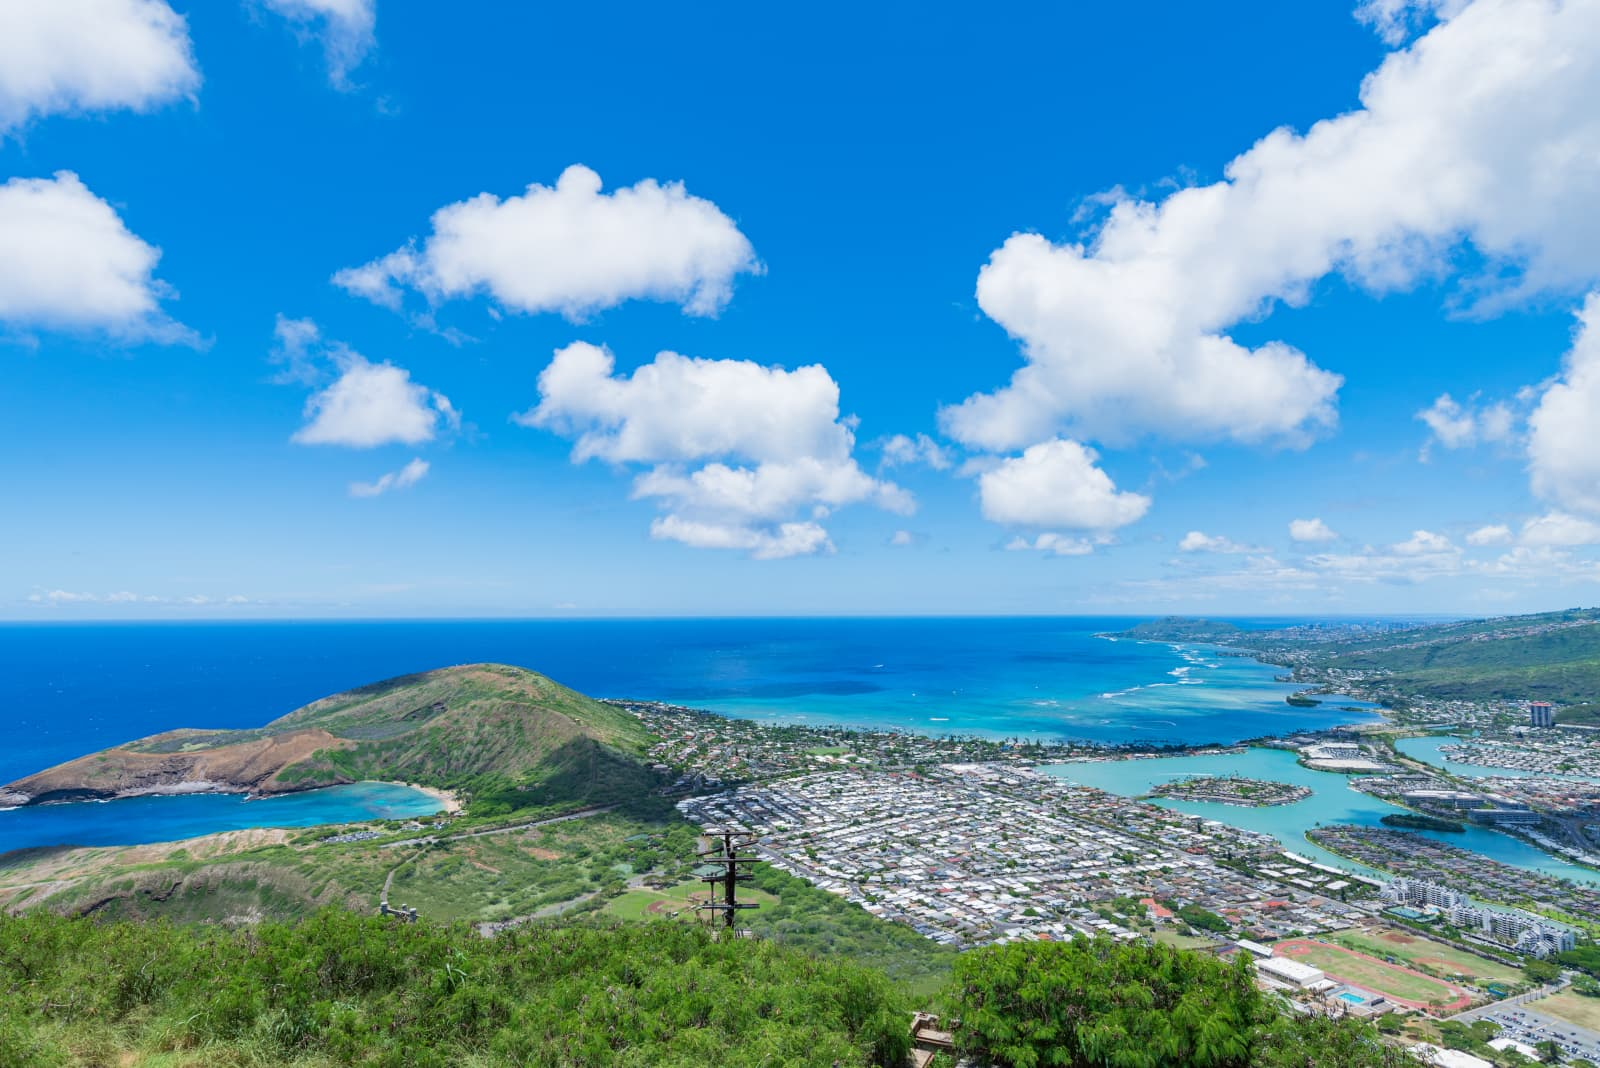 Hawaii Kai from above